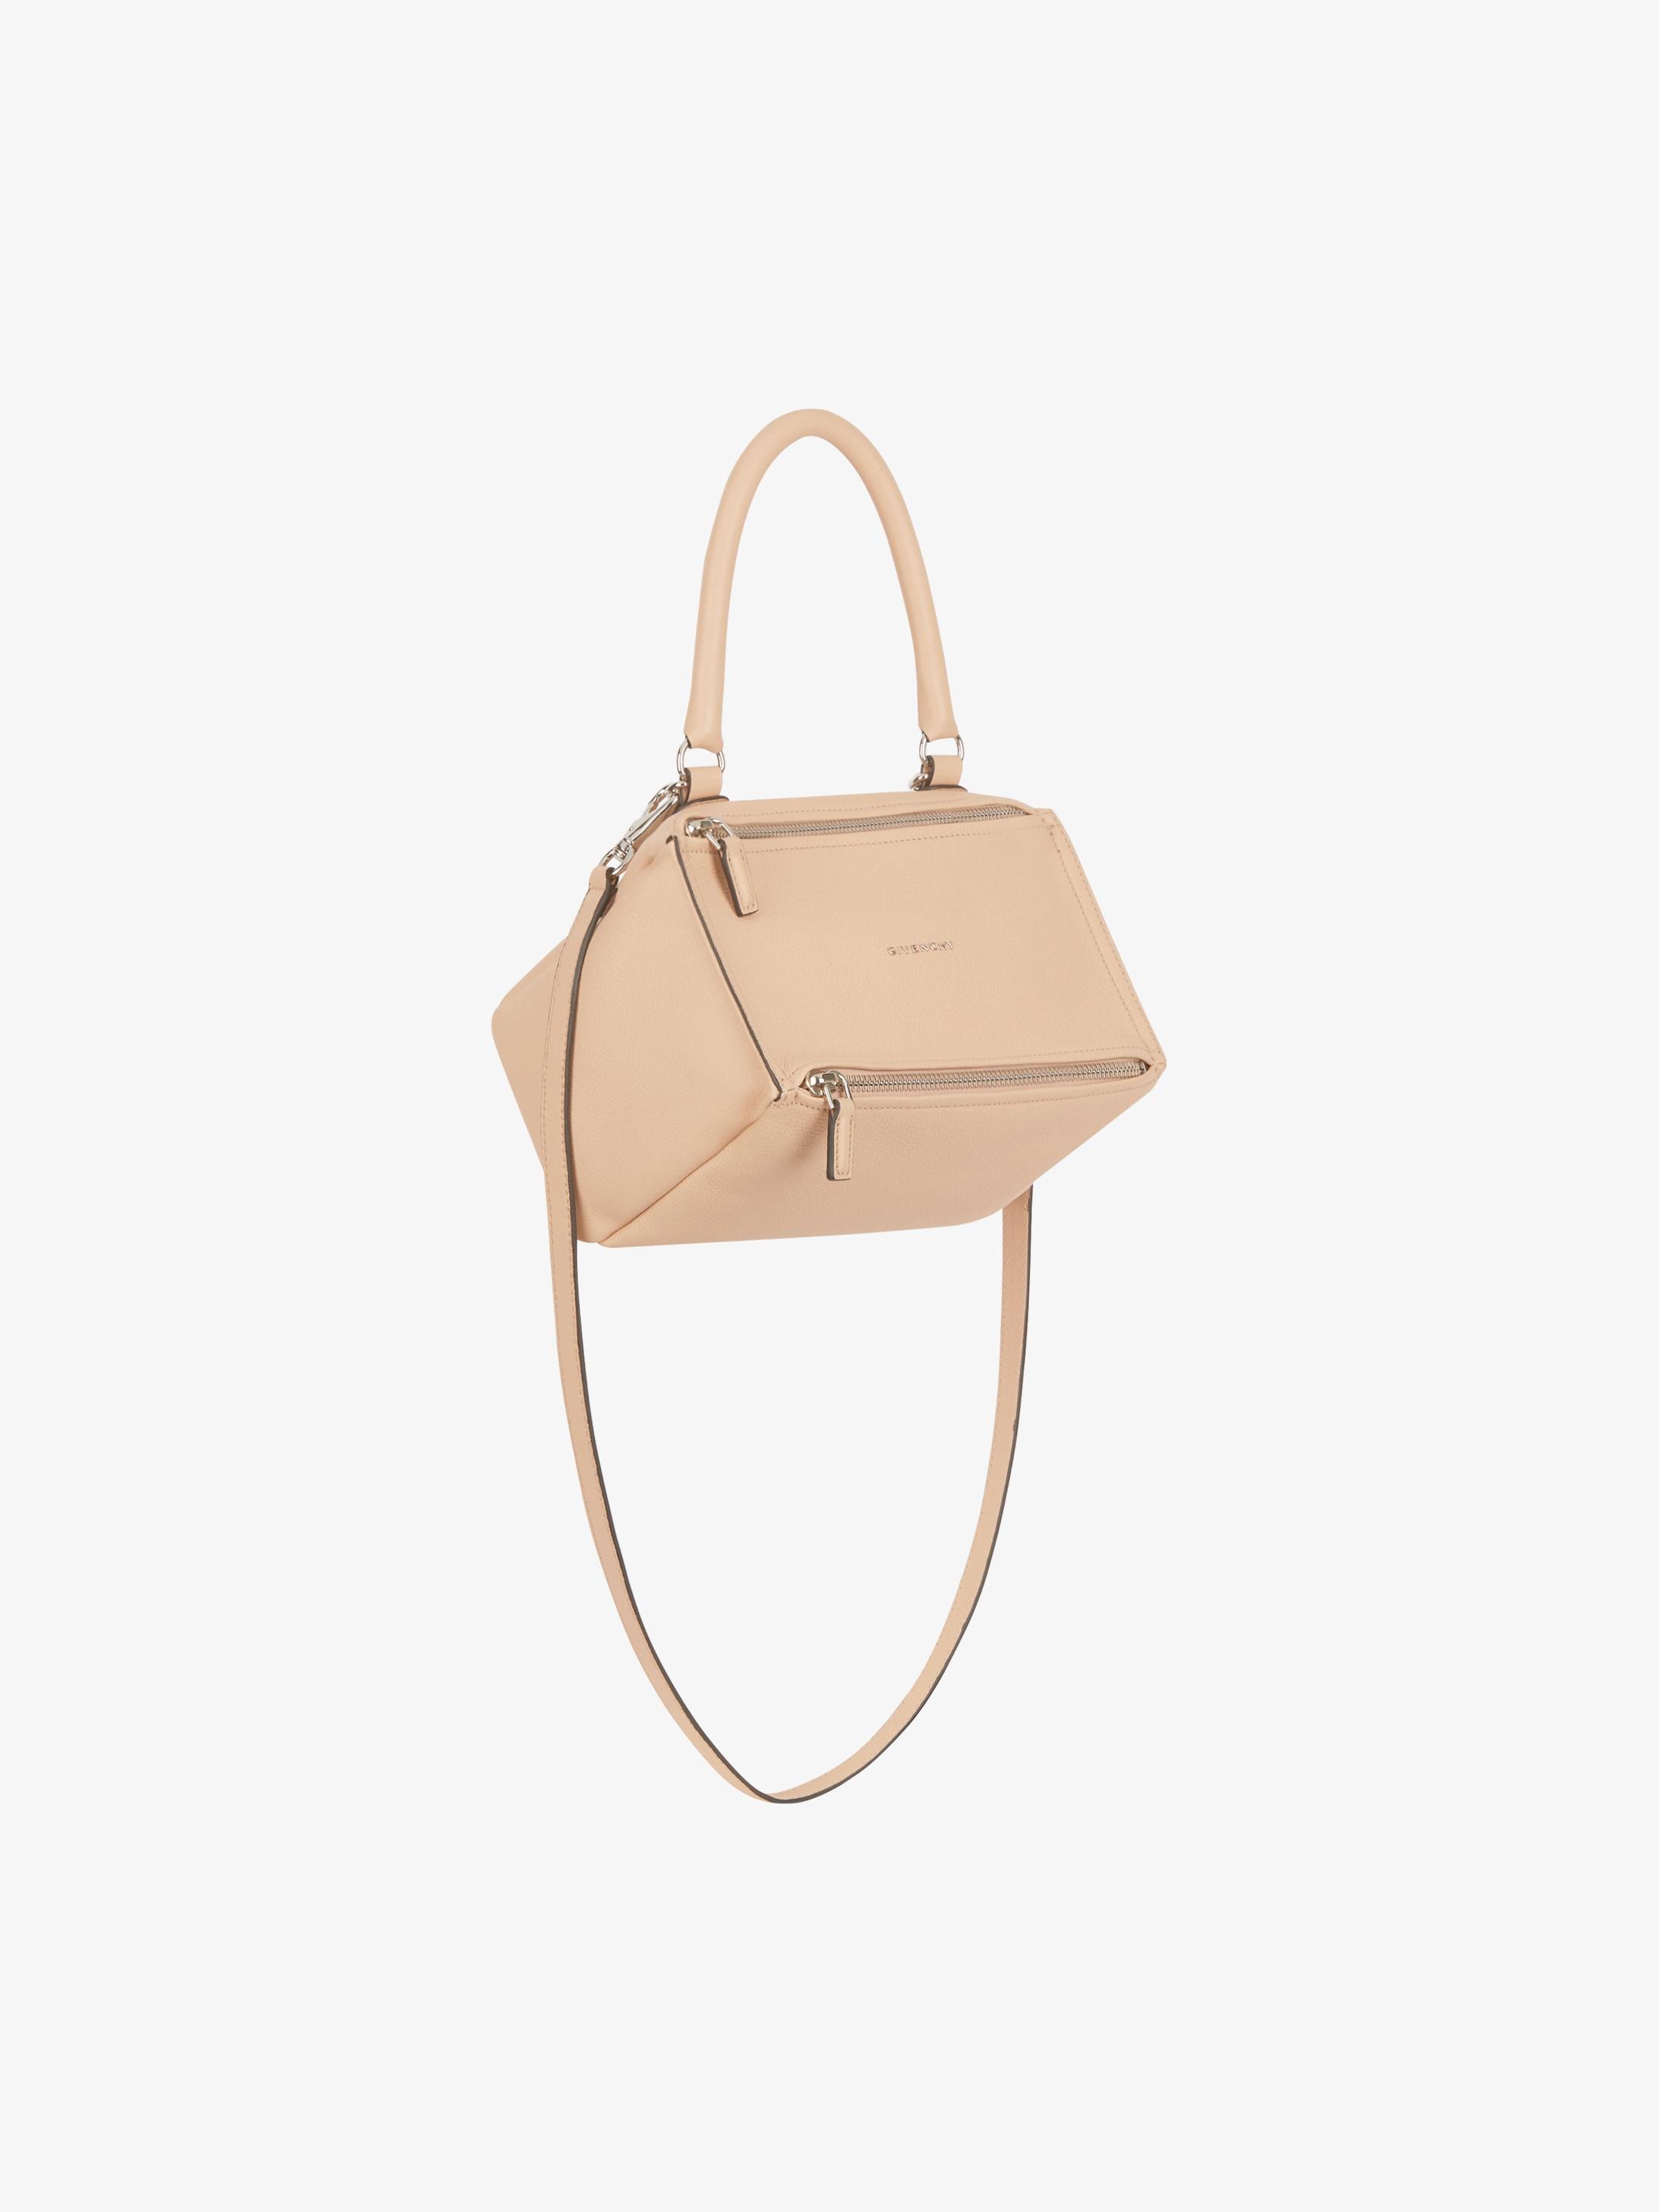 Mini Pandora bag in grained leather